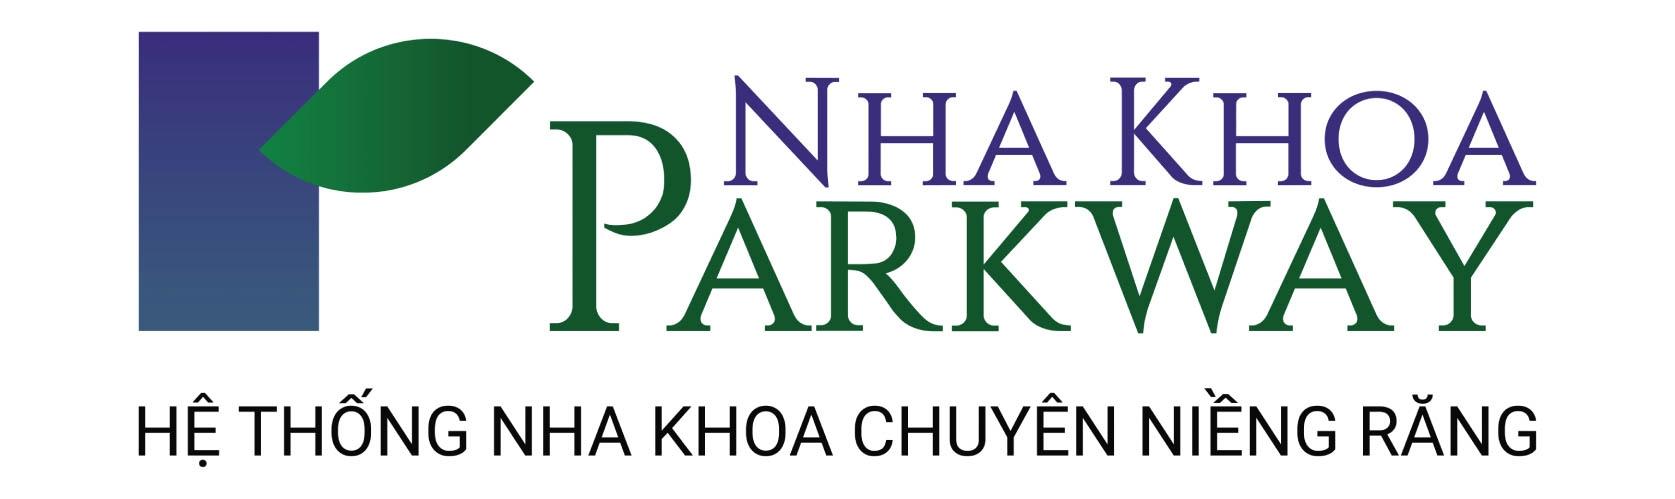 Nha khoa Parkway - Hệ thống nha khoa niêng (@nhakhoaparkwayofficial) Cover Image